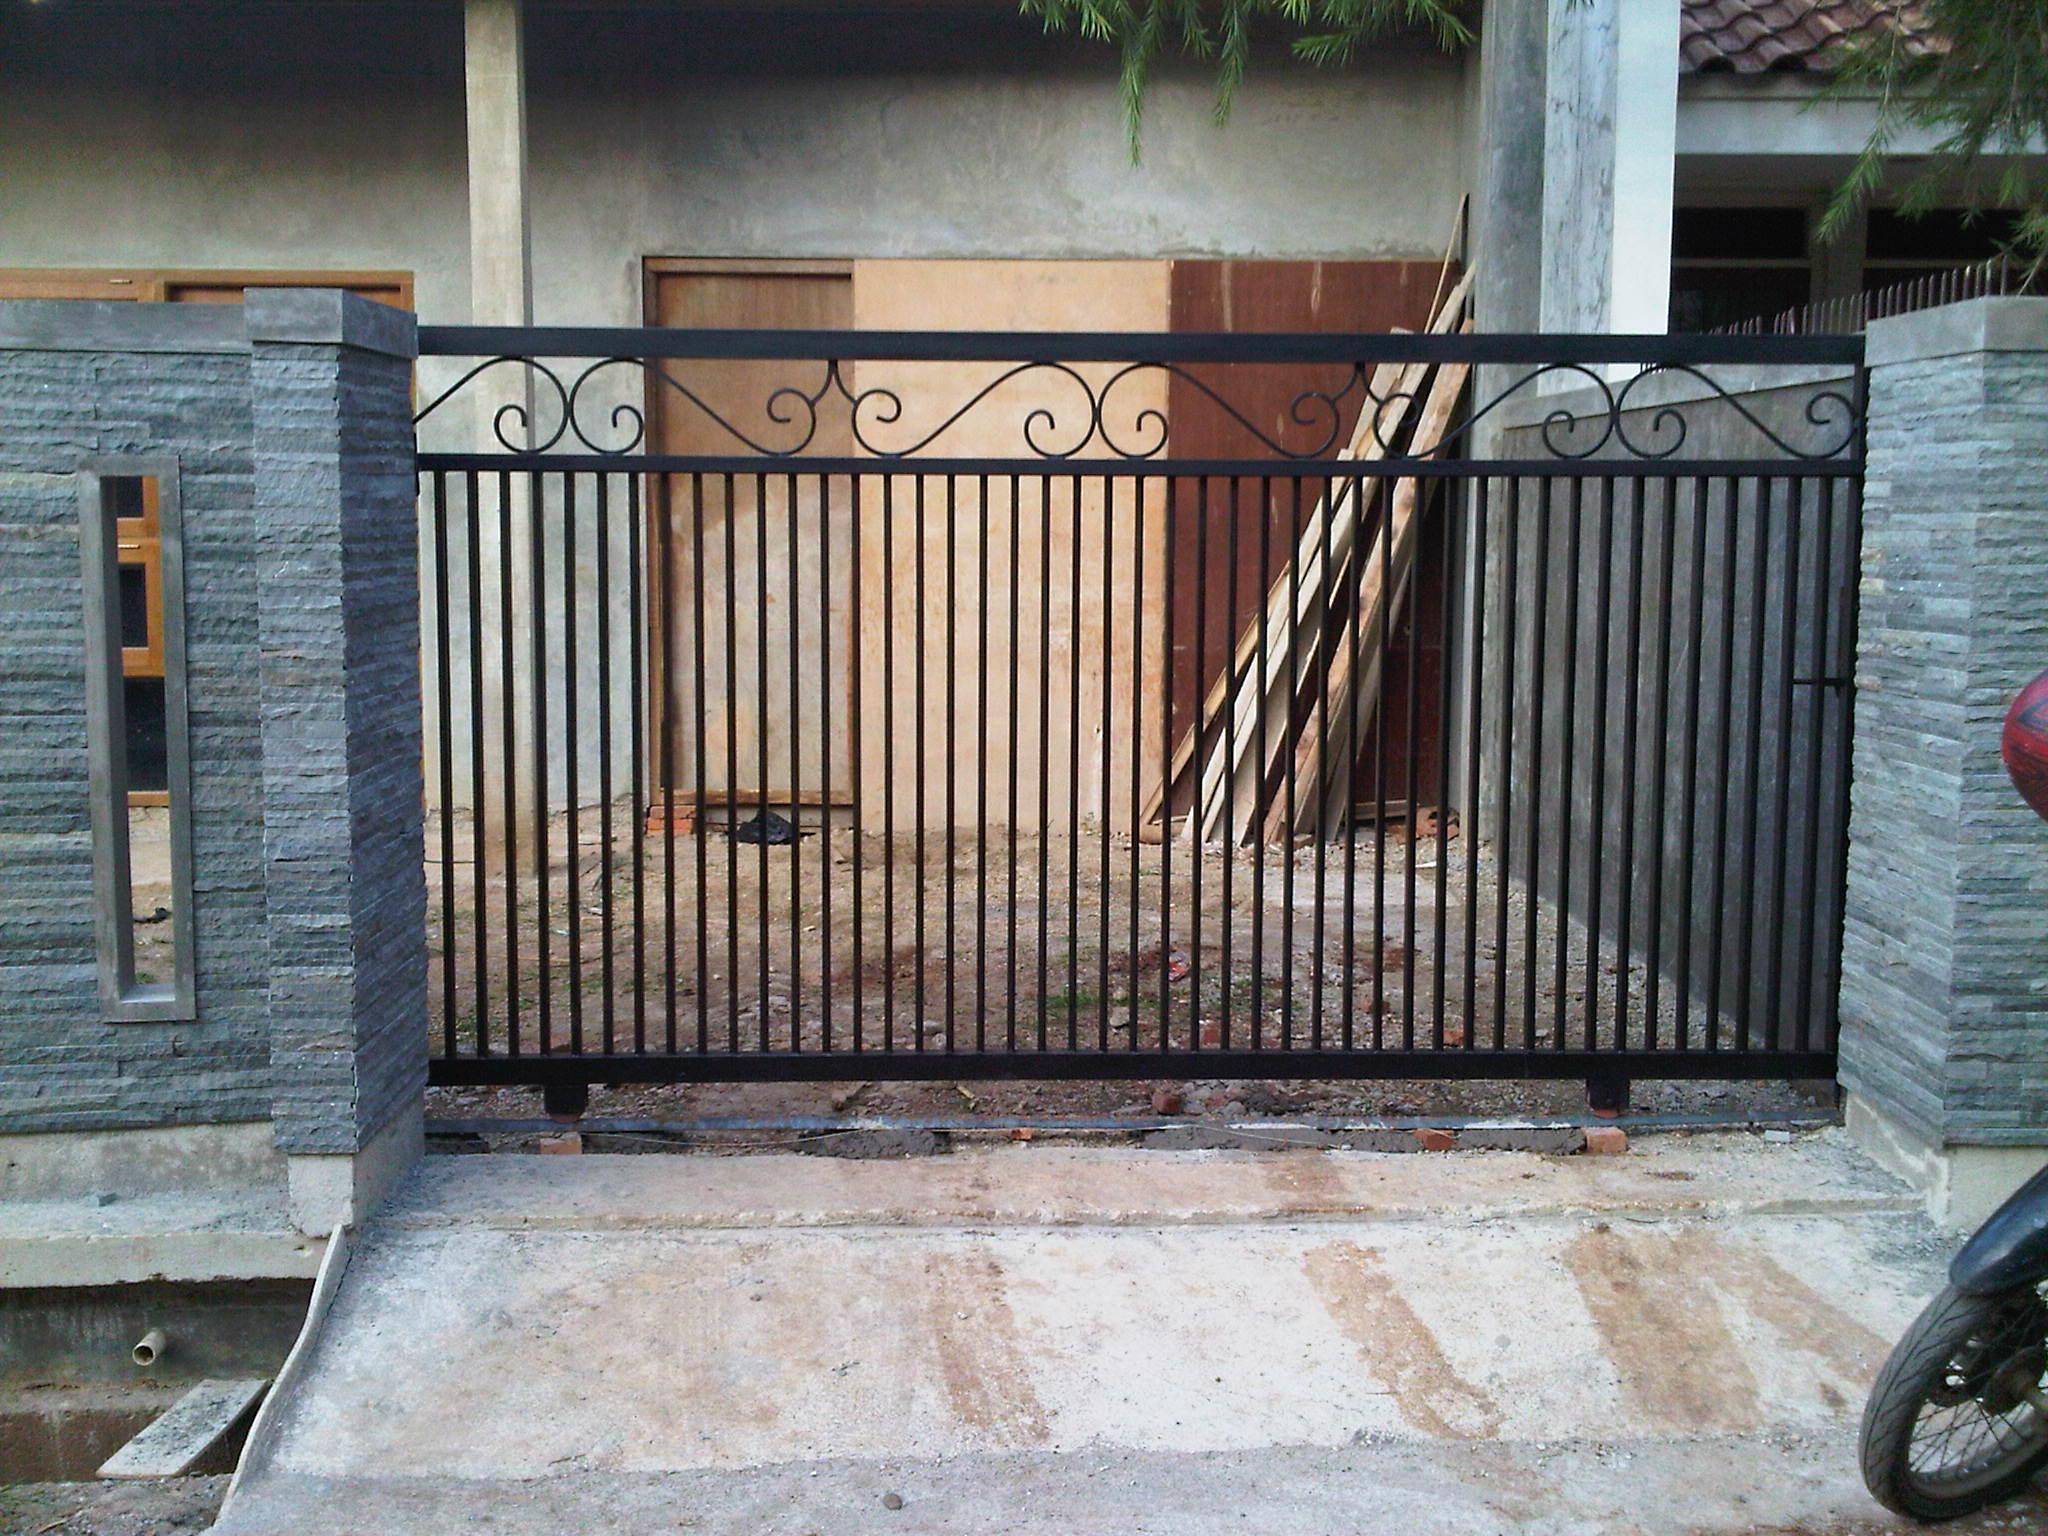 Pembuatan pagar (proses pembangunan Rumah) | My lovely baby